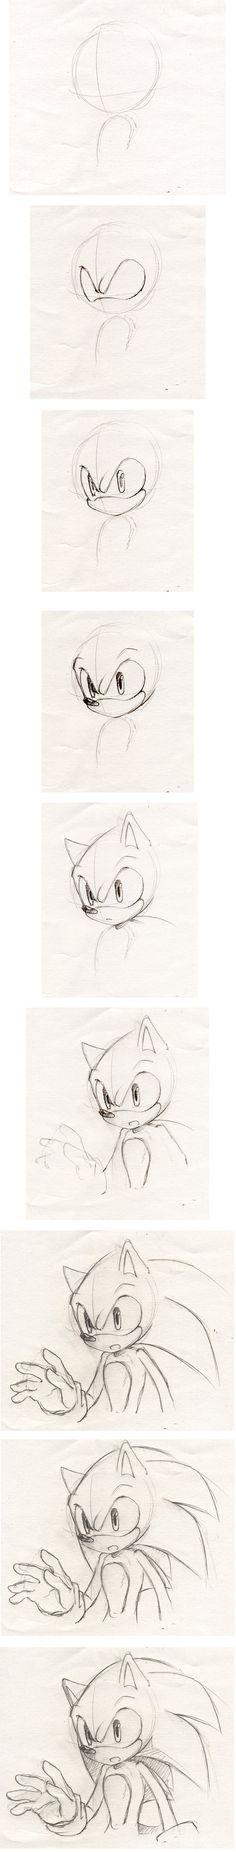 Sonic the hedgehog Tutorials favourites by Spectrum-Dragonoid on DeviantArt